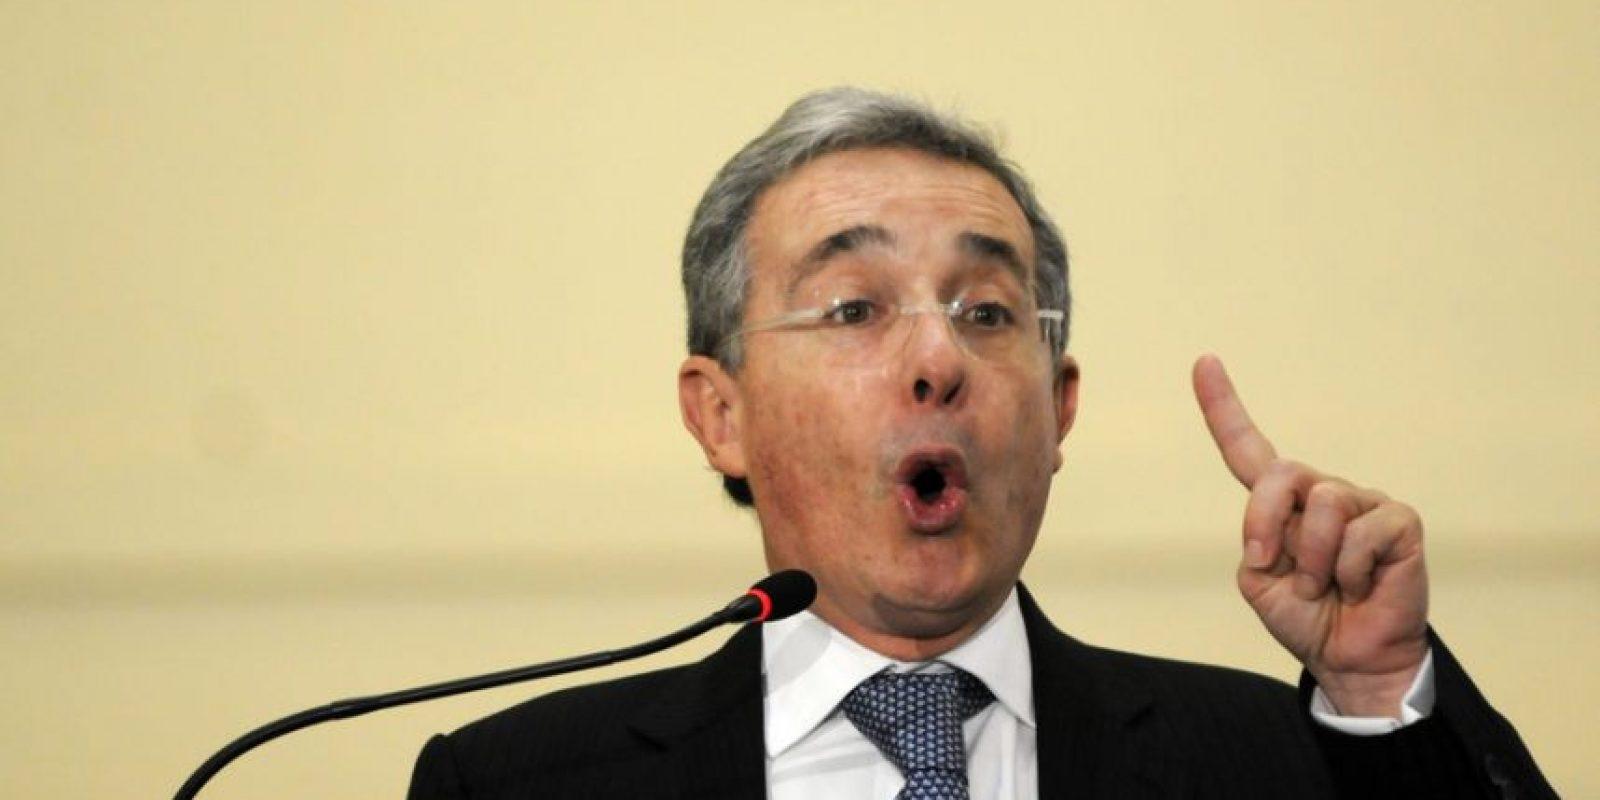 Álvaro Uribe. Imagen Por: Inagen: EFE